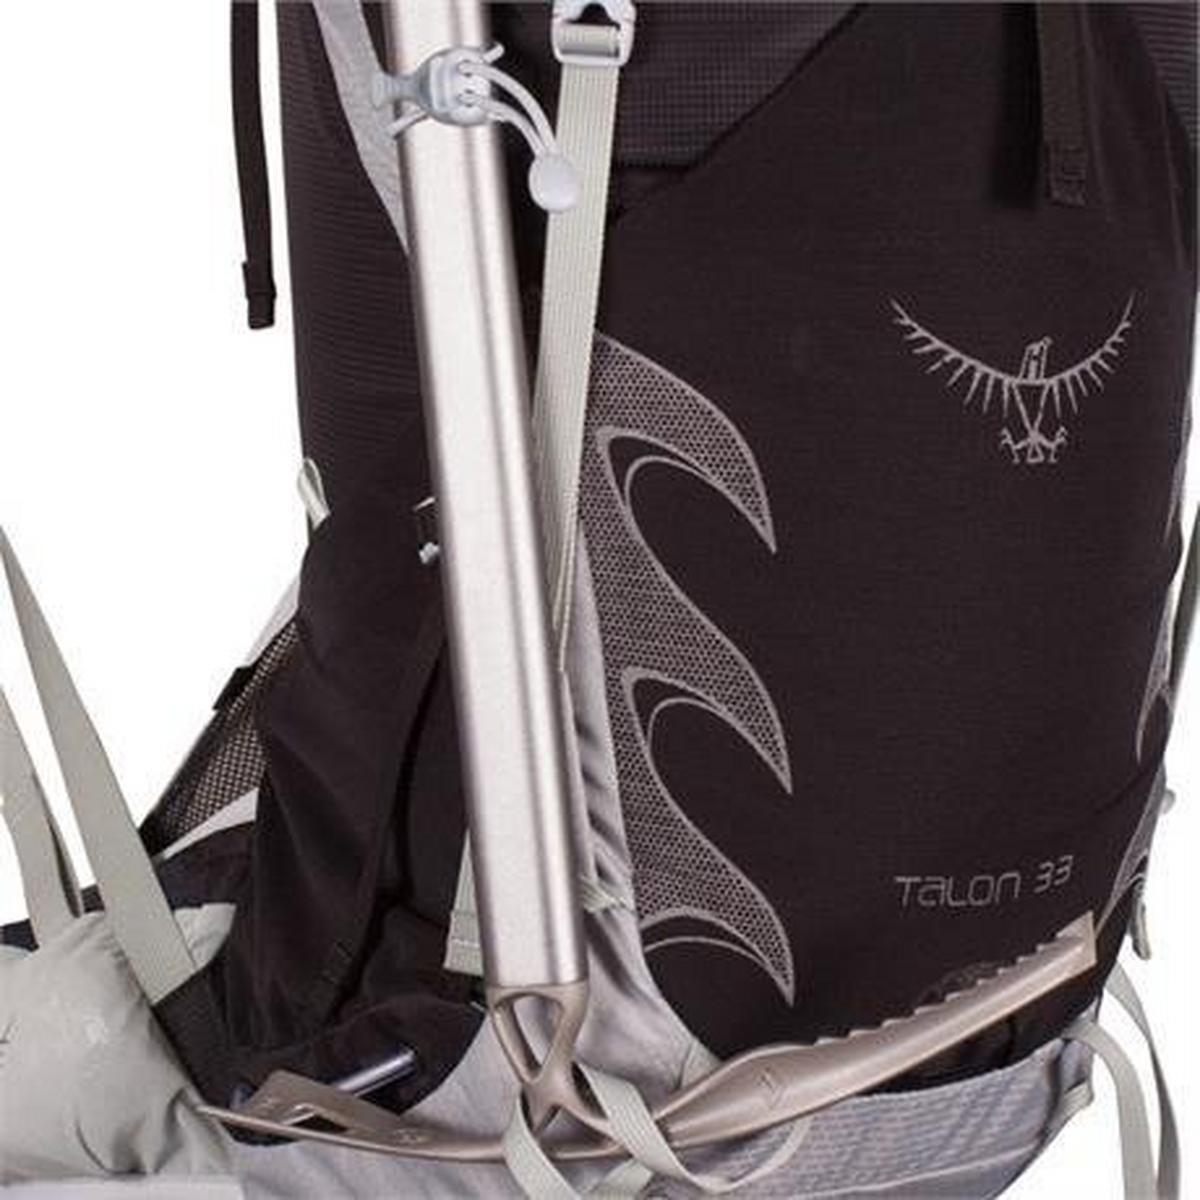 Osprey Talon 33 Rucksack - Black